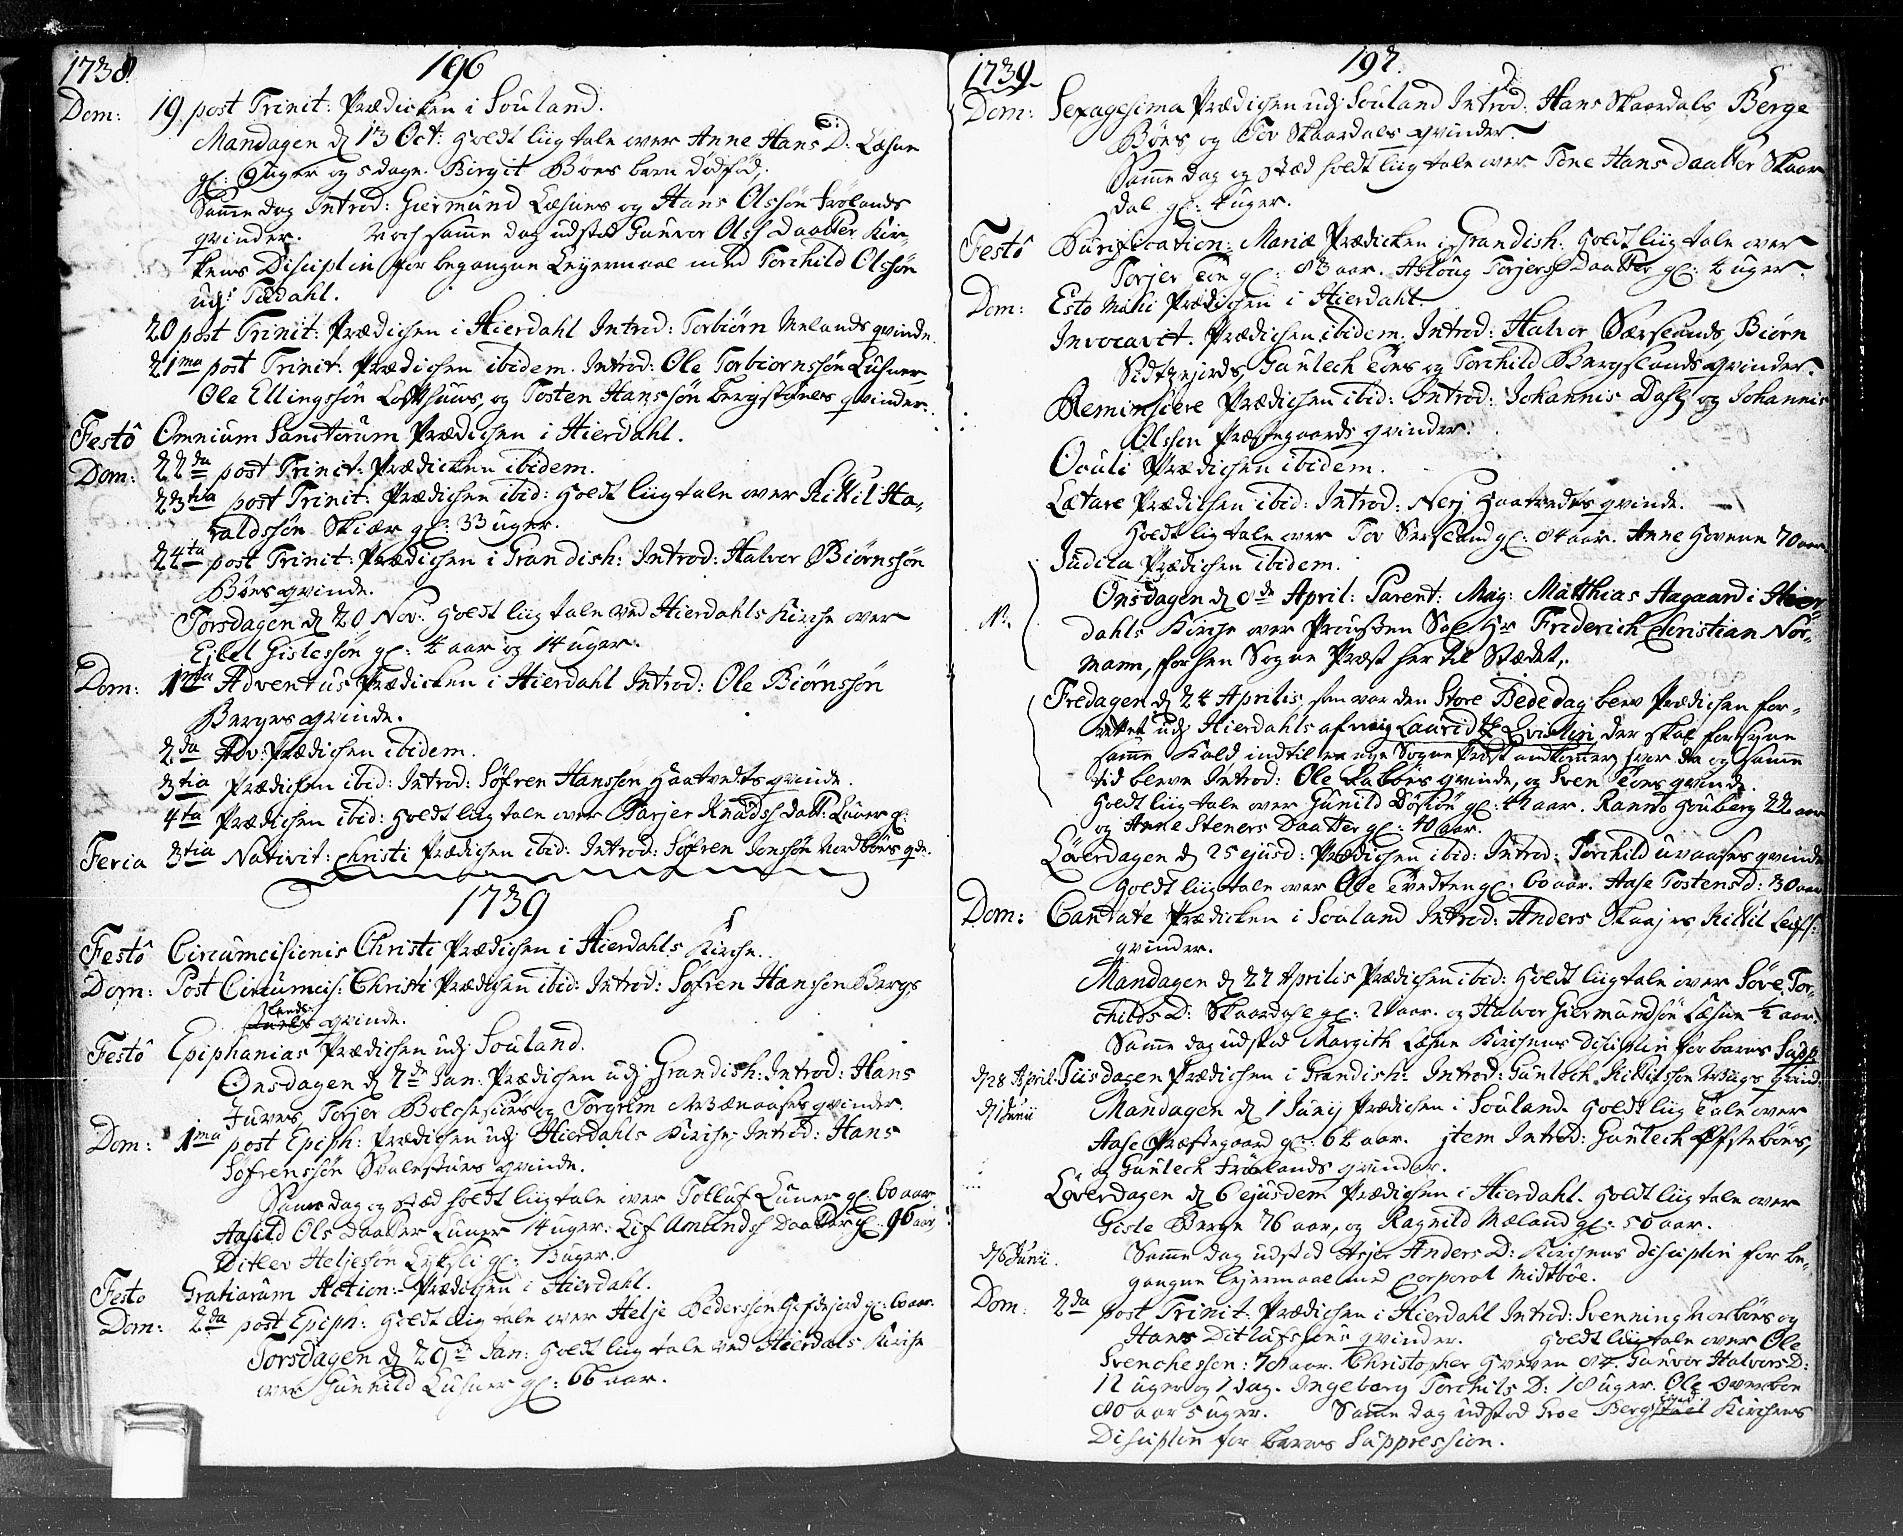 SAKO, Hjartdal kirkebøker, F/Fa/L0002: Ministerialbok nr. I 2, 1716-1754, s. 196-197